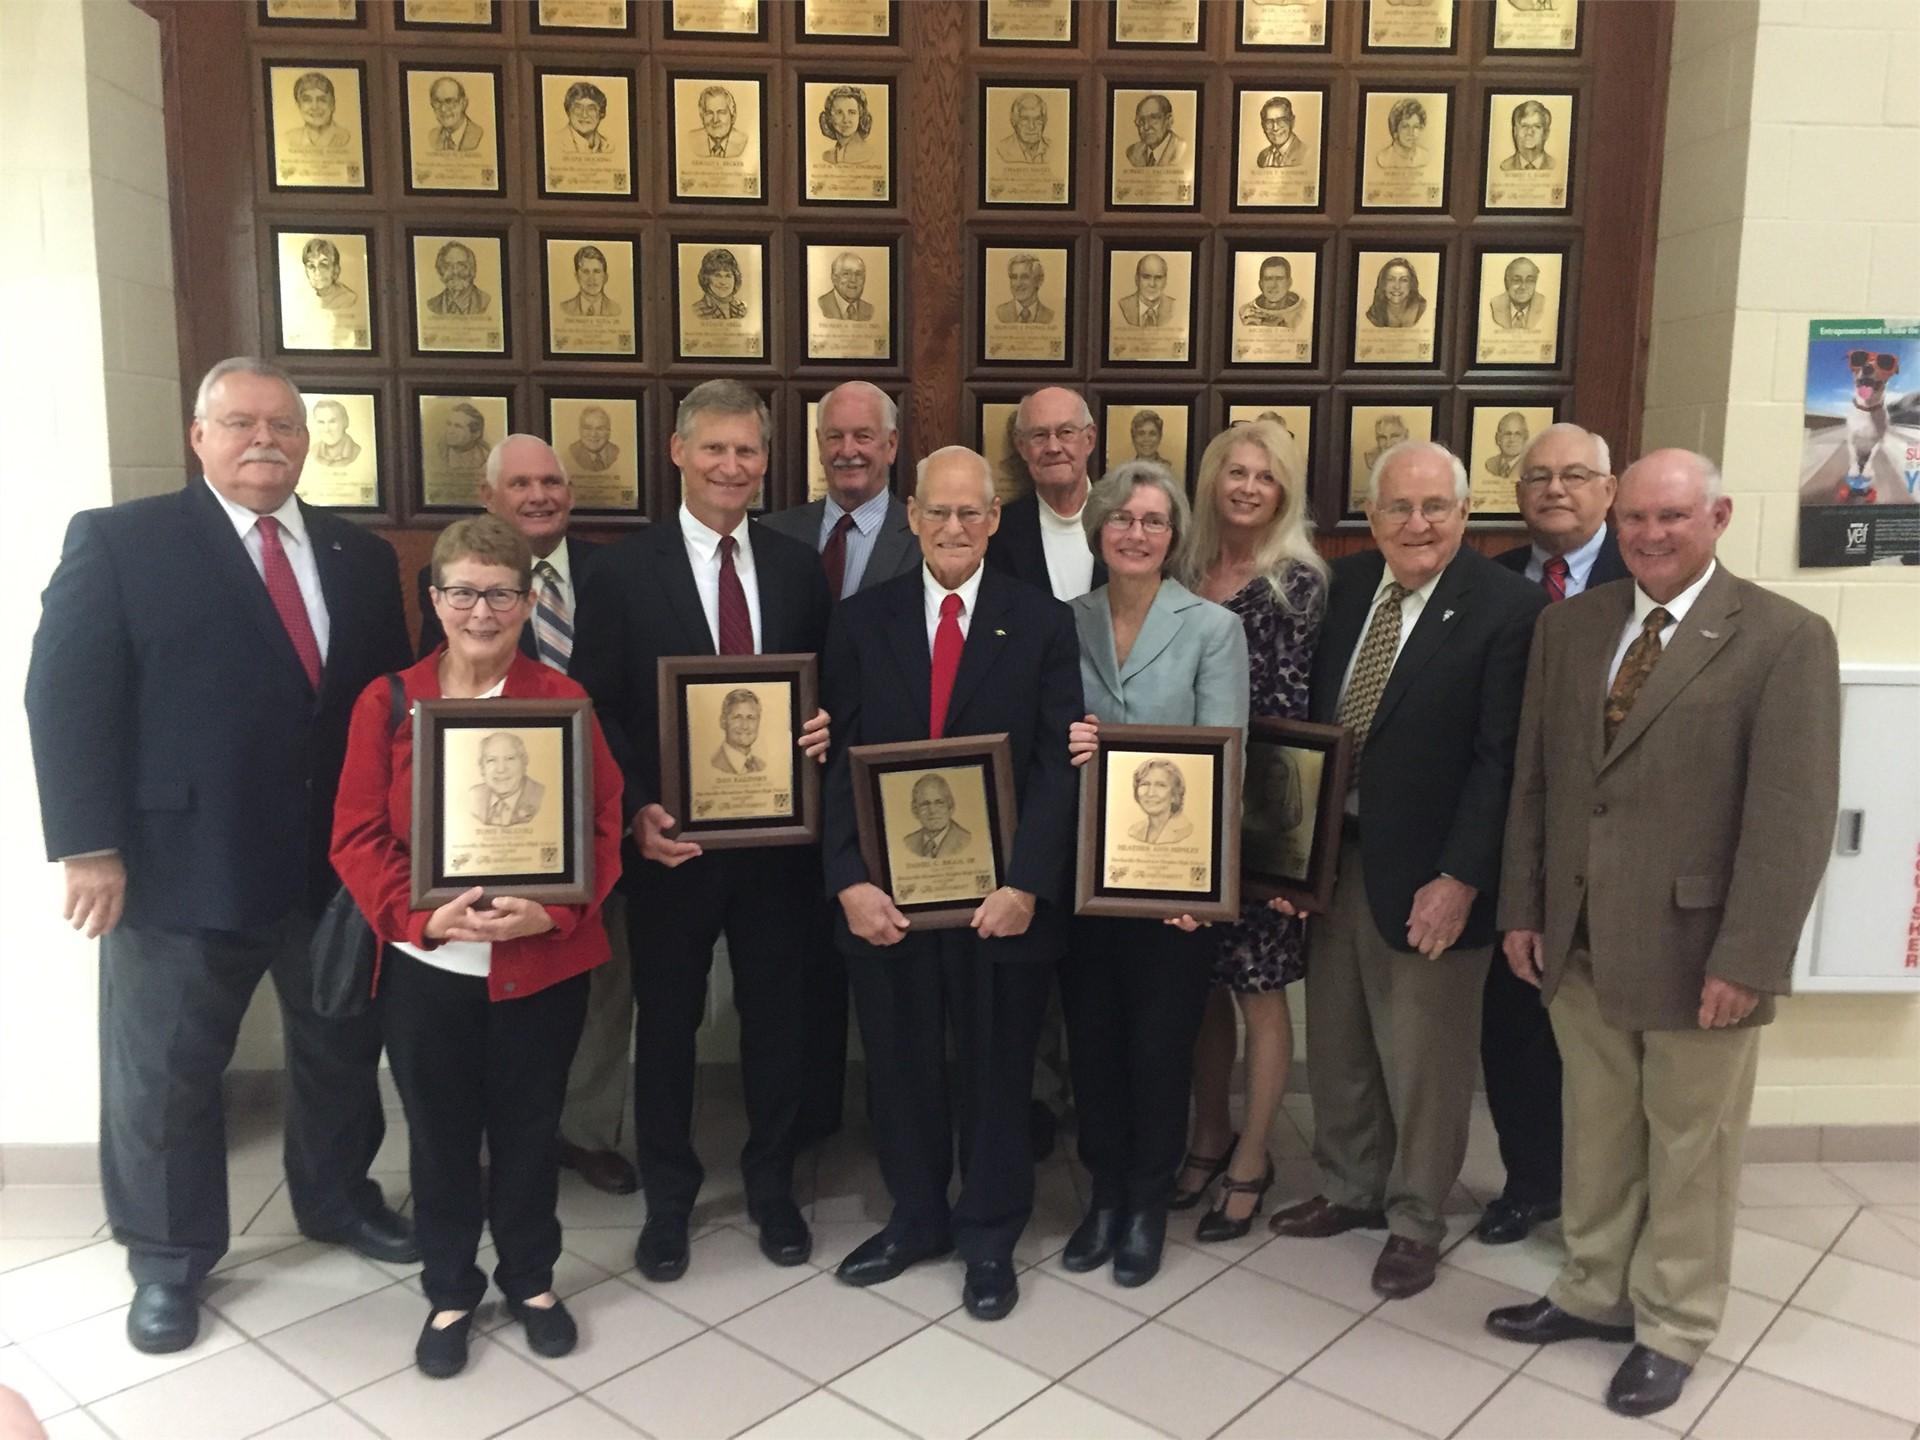 BBHHS Alumni Association Gallery of Achievement